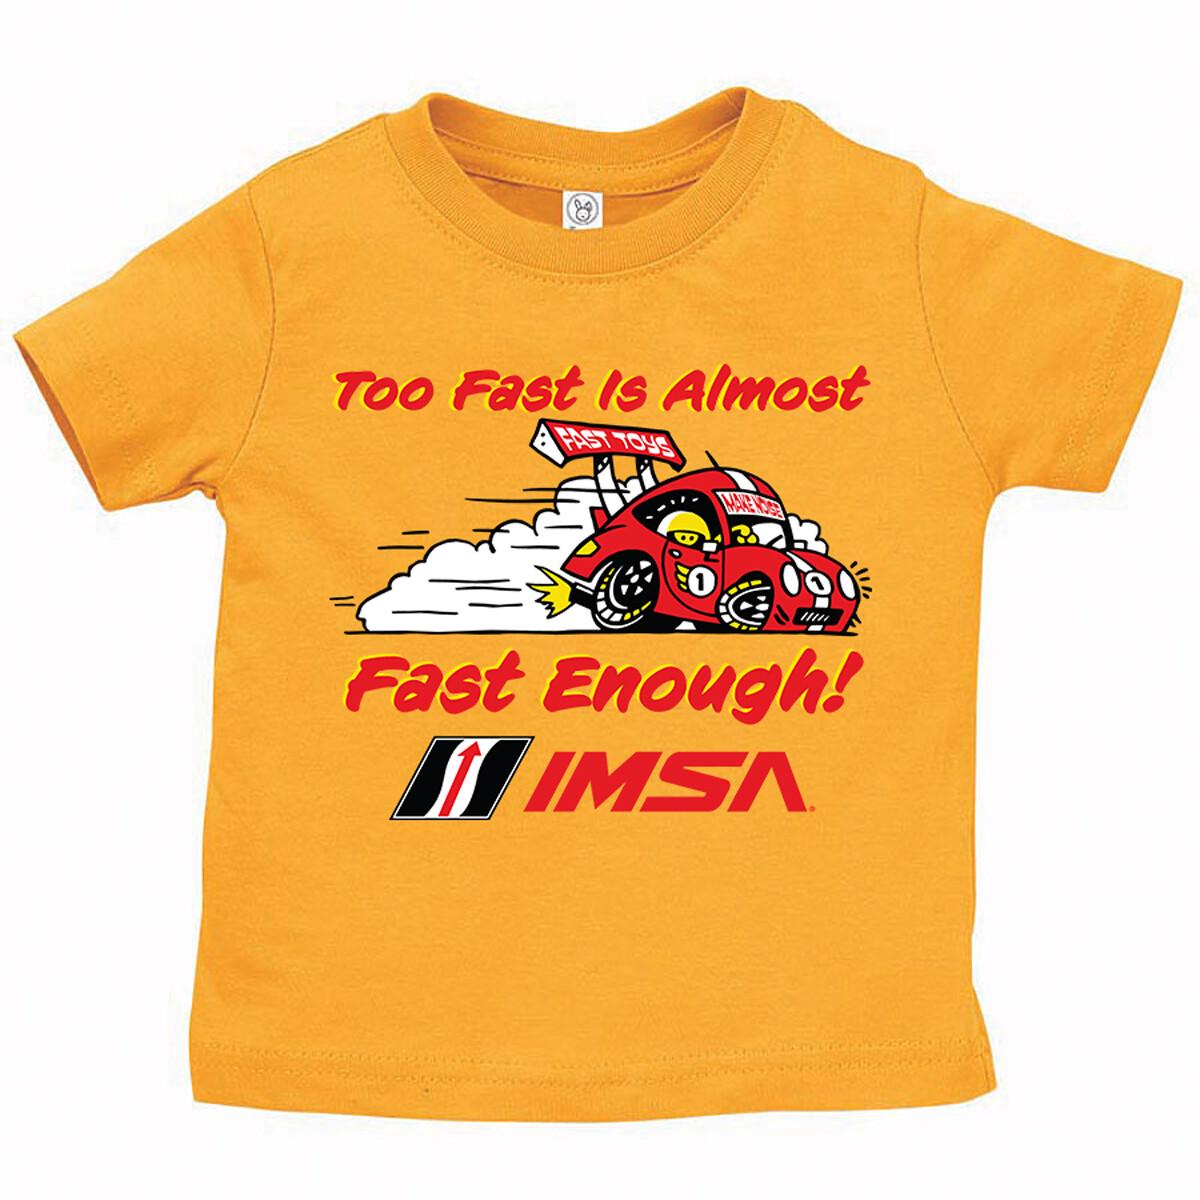 IMSA Infant Fast T-Gold